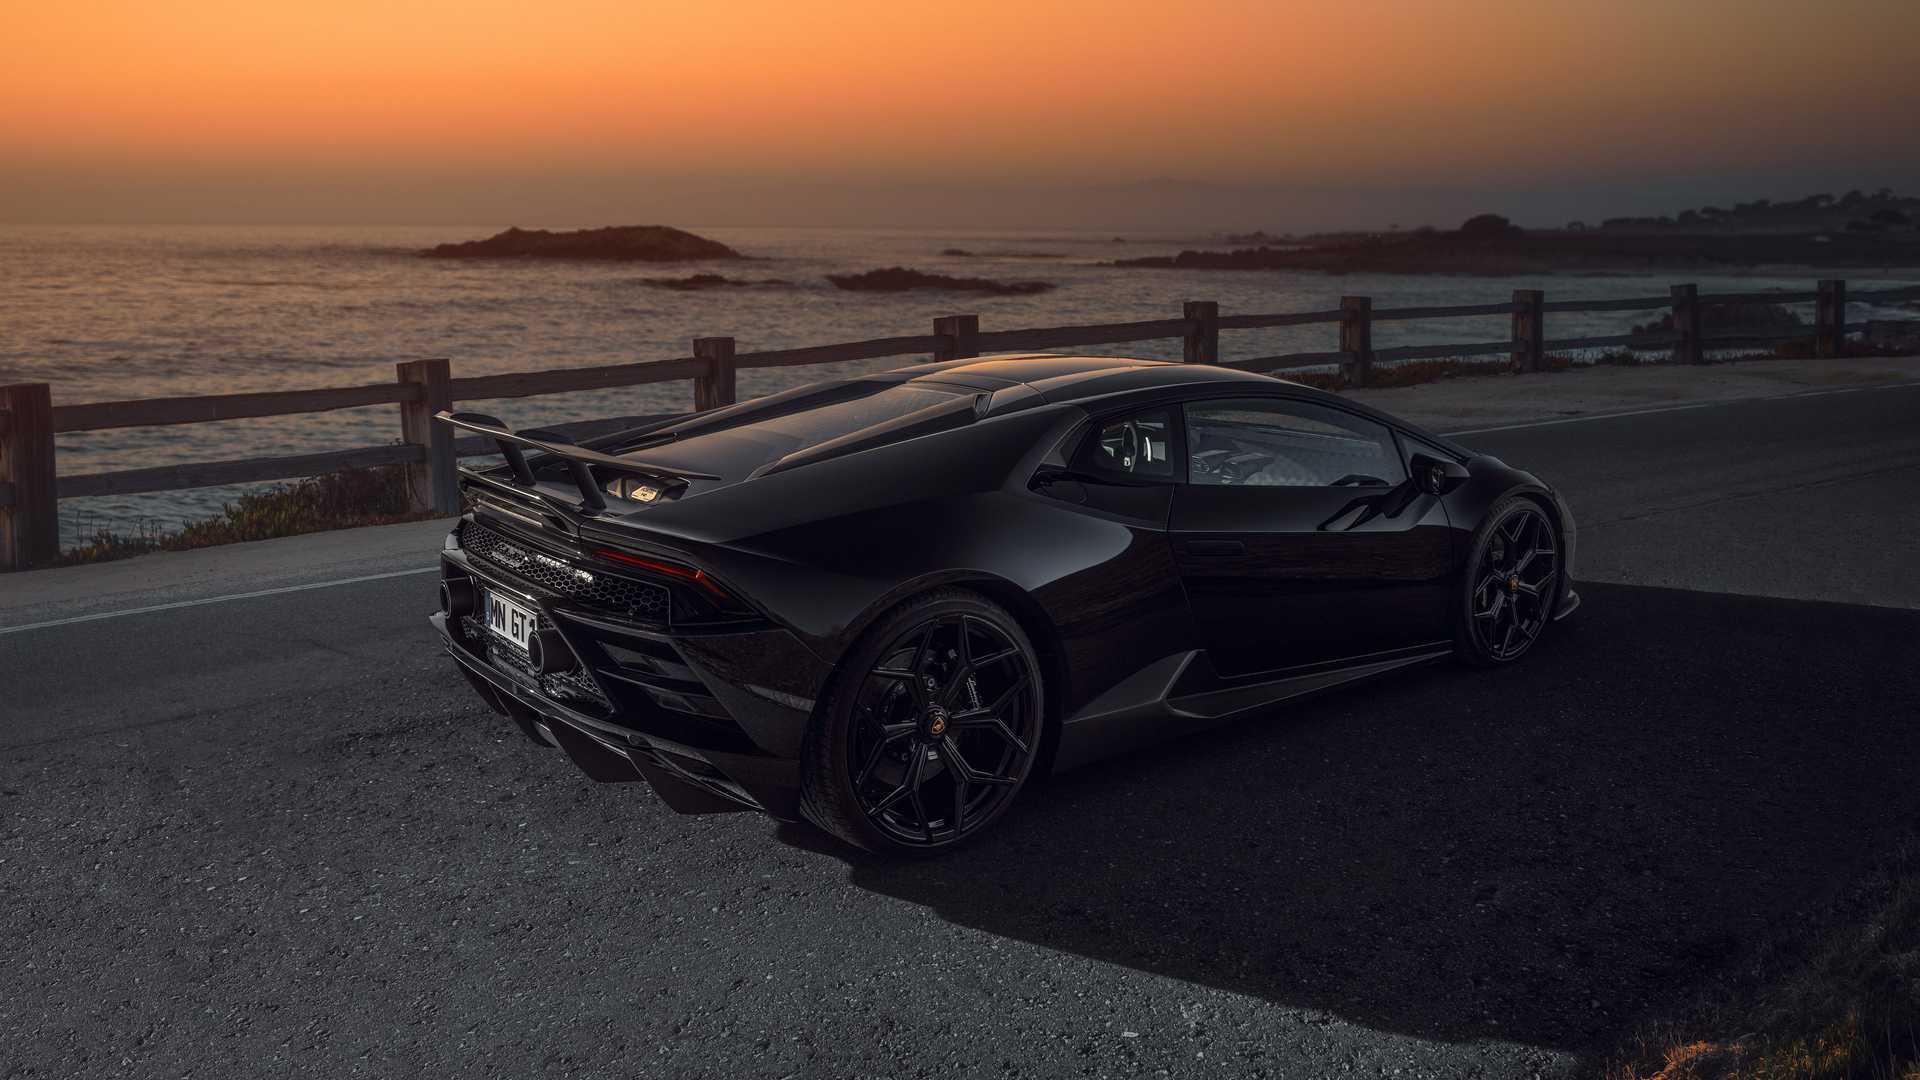 Lamborghini Huracan Evo By Novitec Rear Corner View